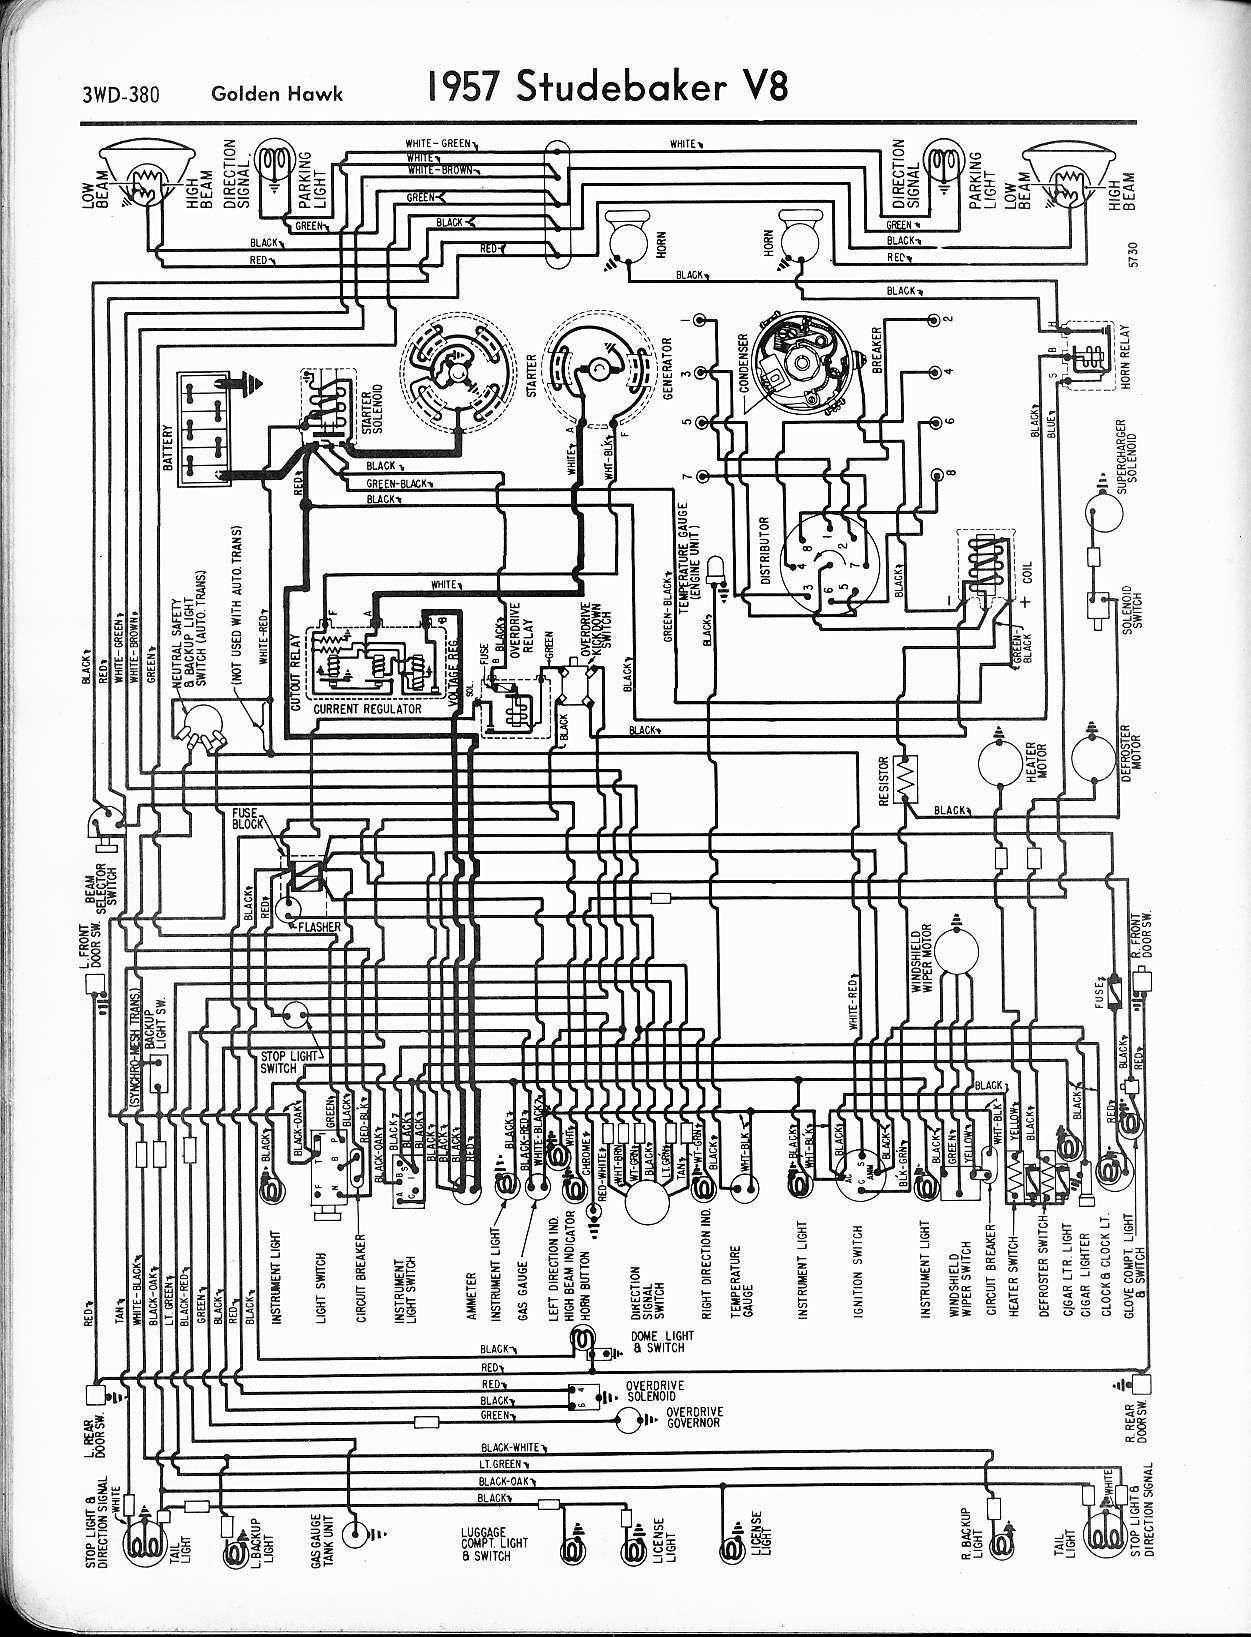 1953 studebaker wiring diagram wiring diagram post studebaker wiring diagrams [ 1251 x 1637 Pixel ]